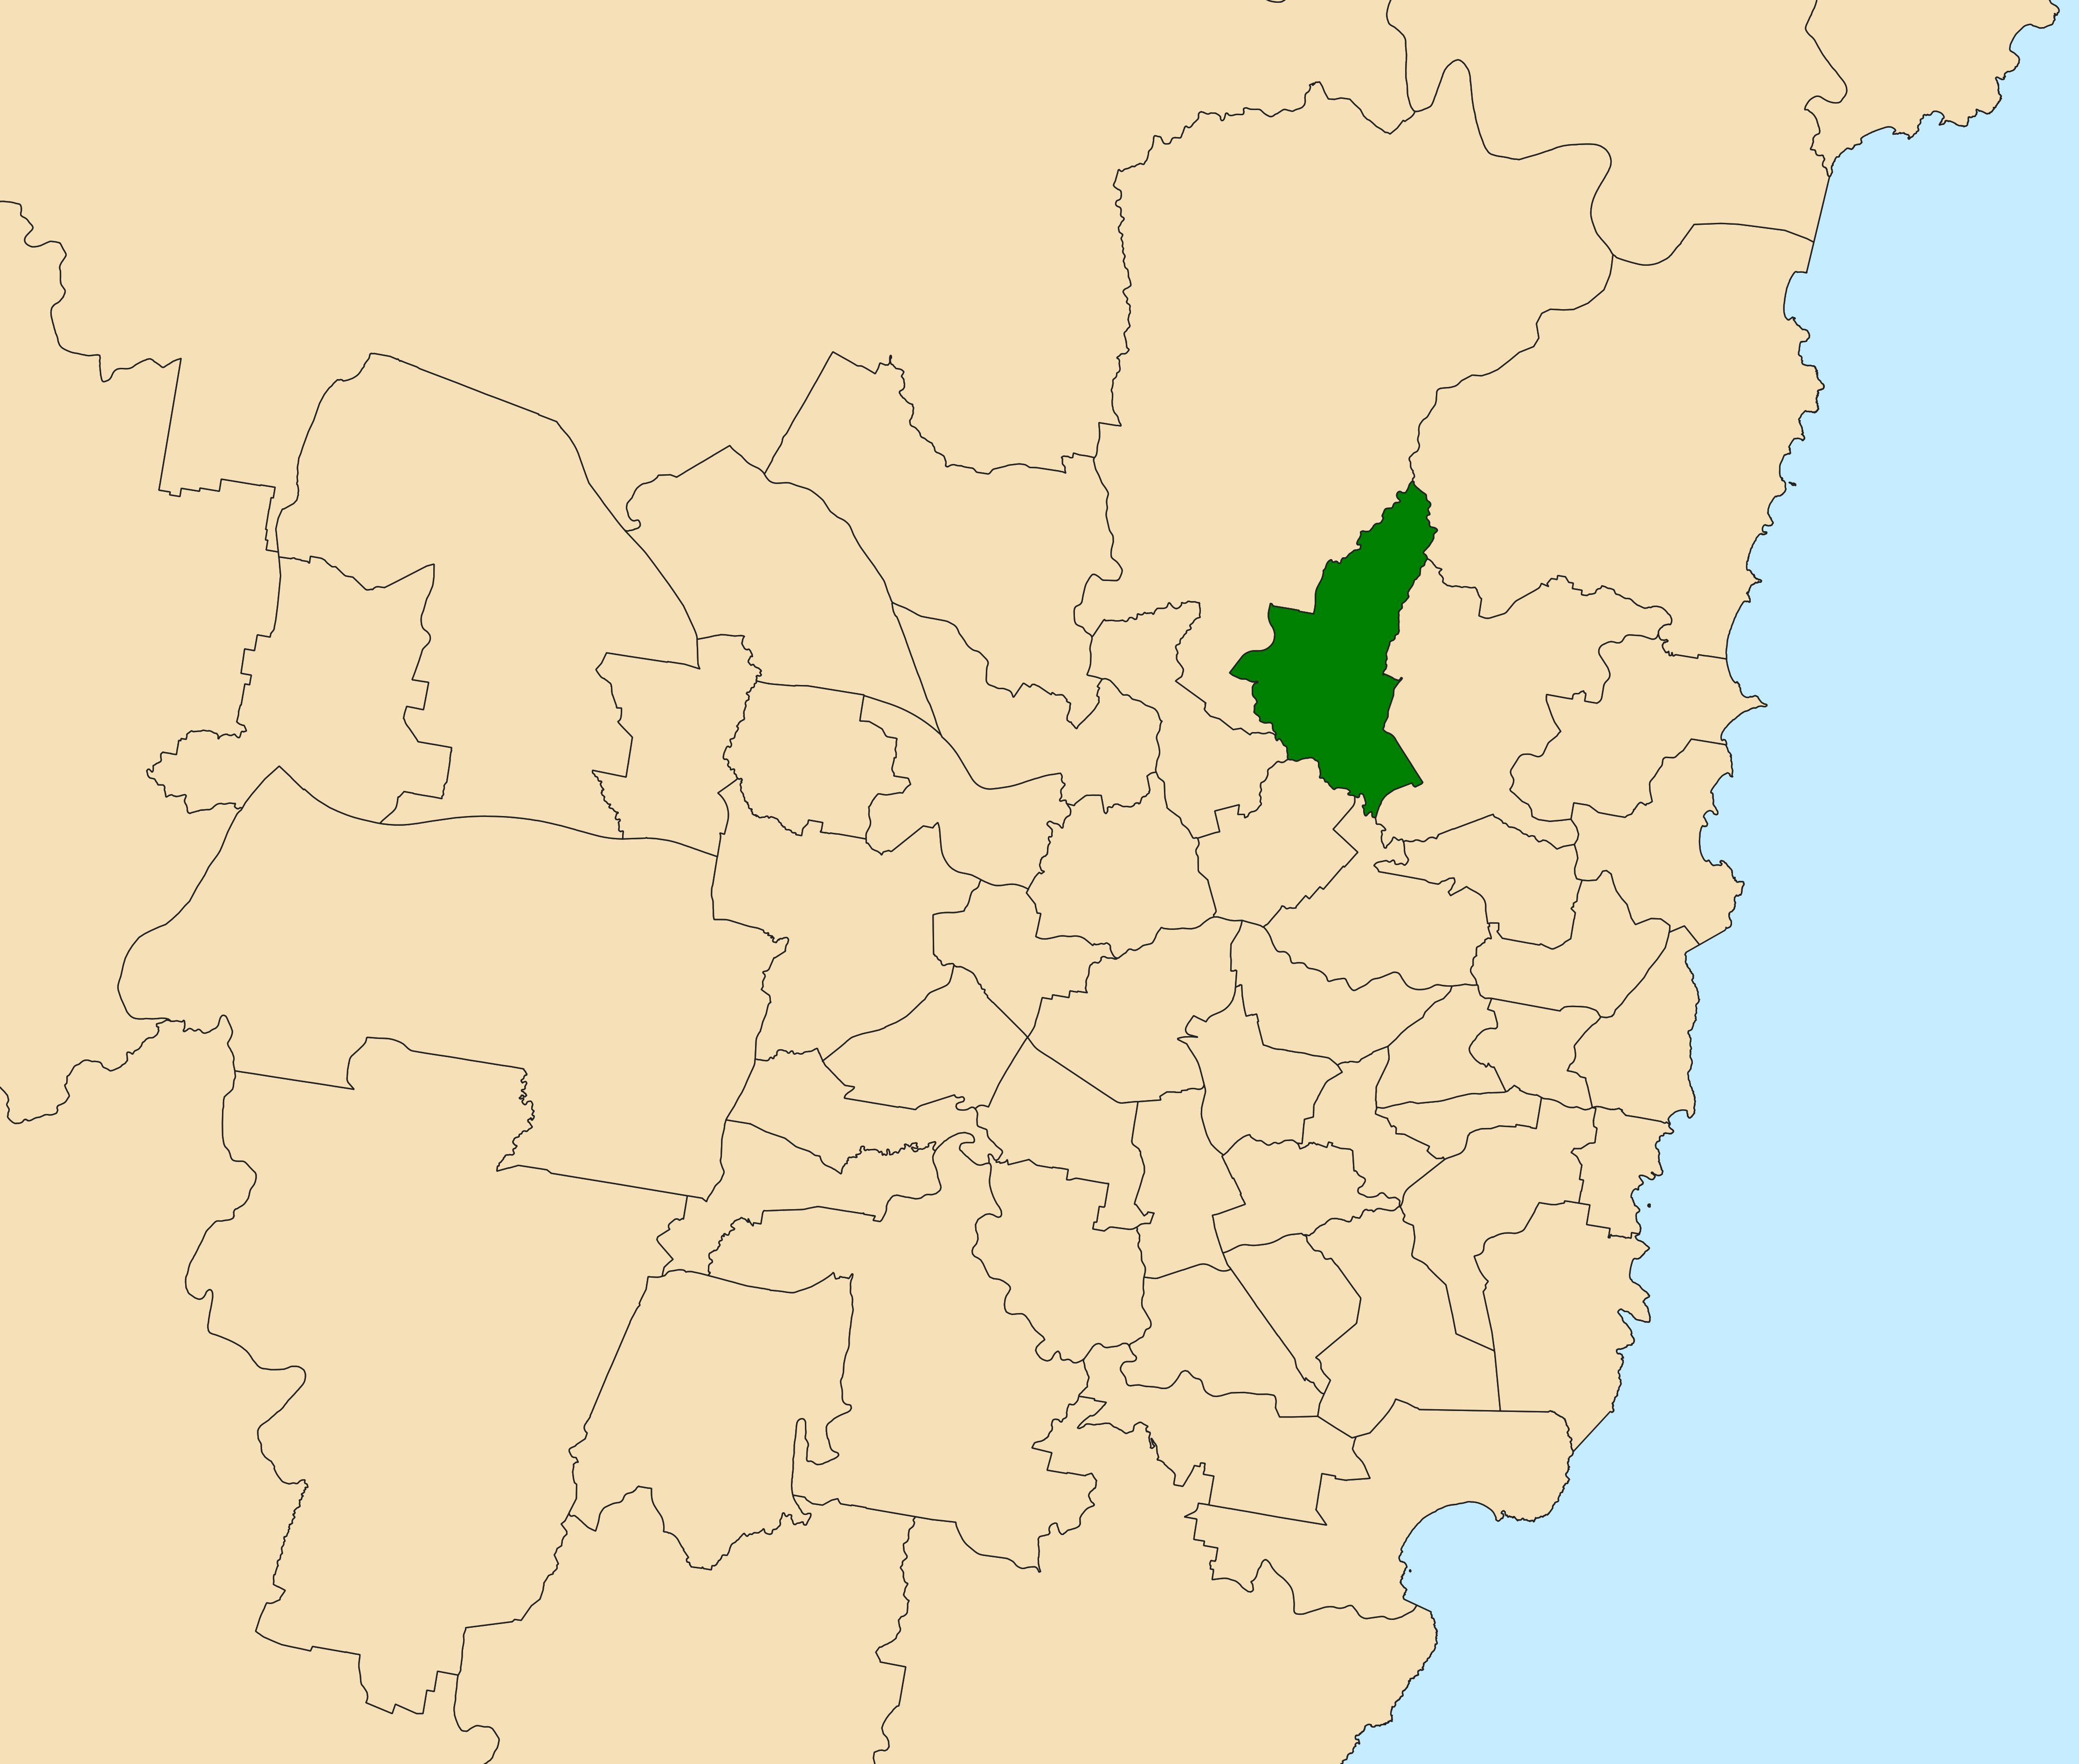 Electoral district of Ku-ring-gai - Wikipedia